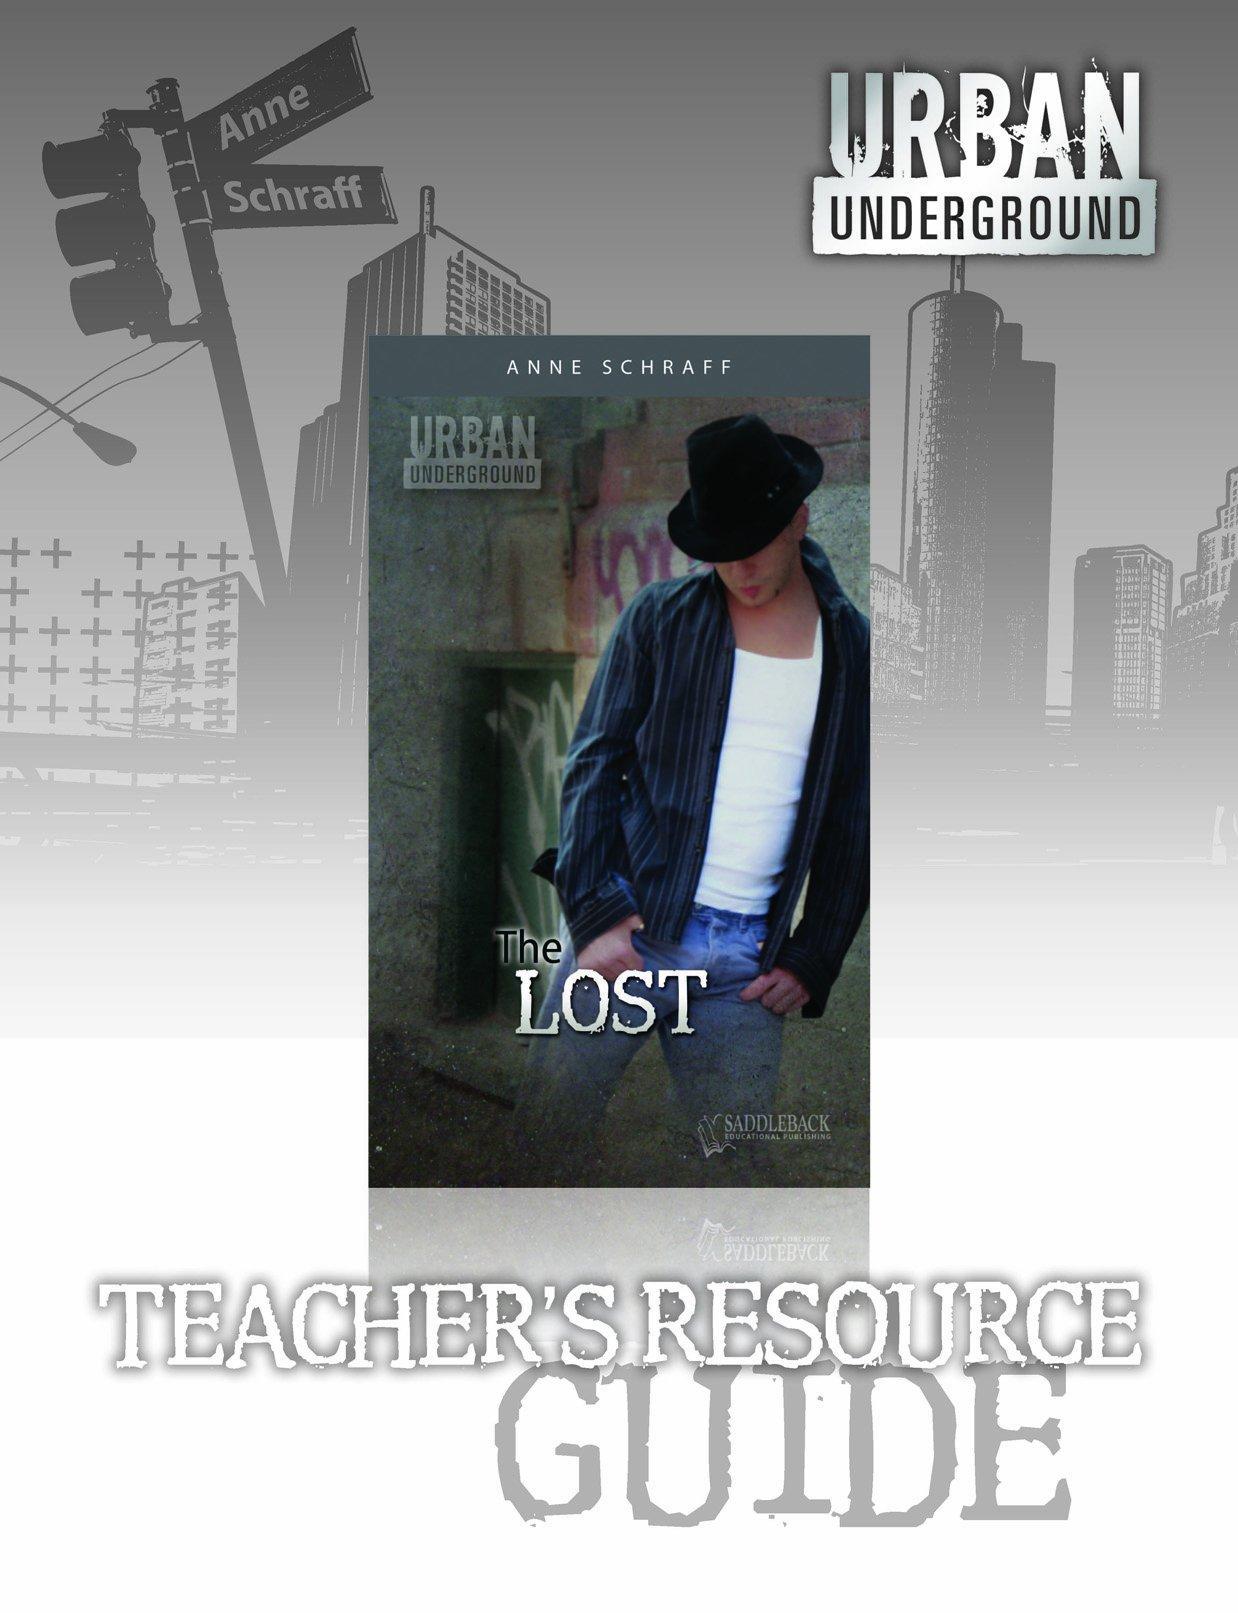 Download The Lost Digital Guide (Urban Underground) PDF